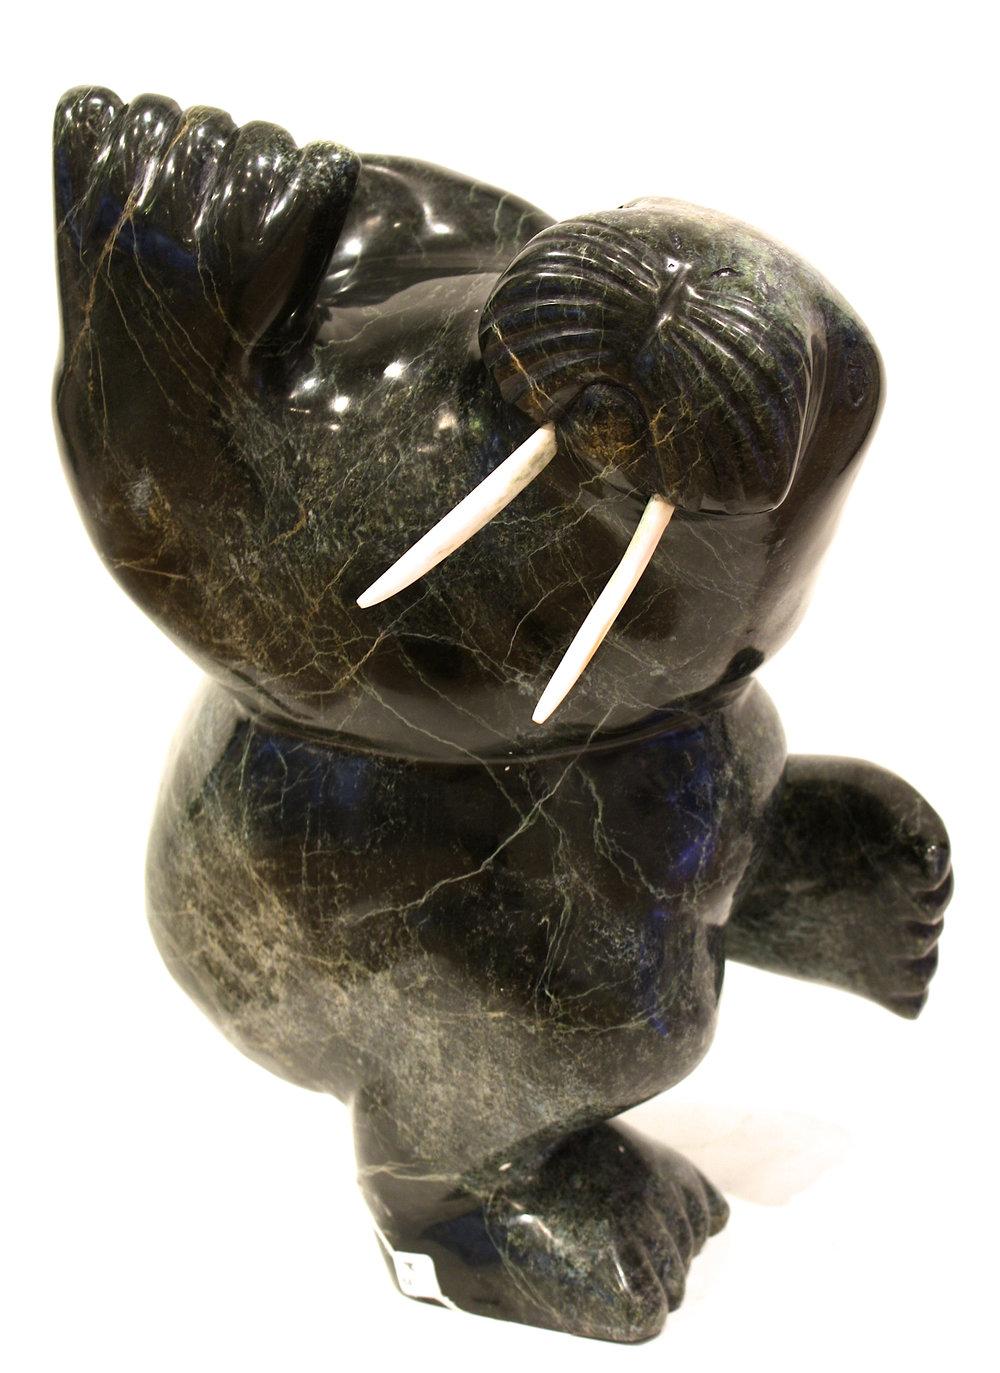 Dancing Walrus<Br>16.5 x 13 x 8<Br>Serpentine and Bone<Br>$ 7500